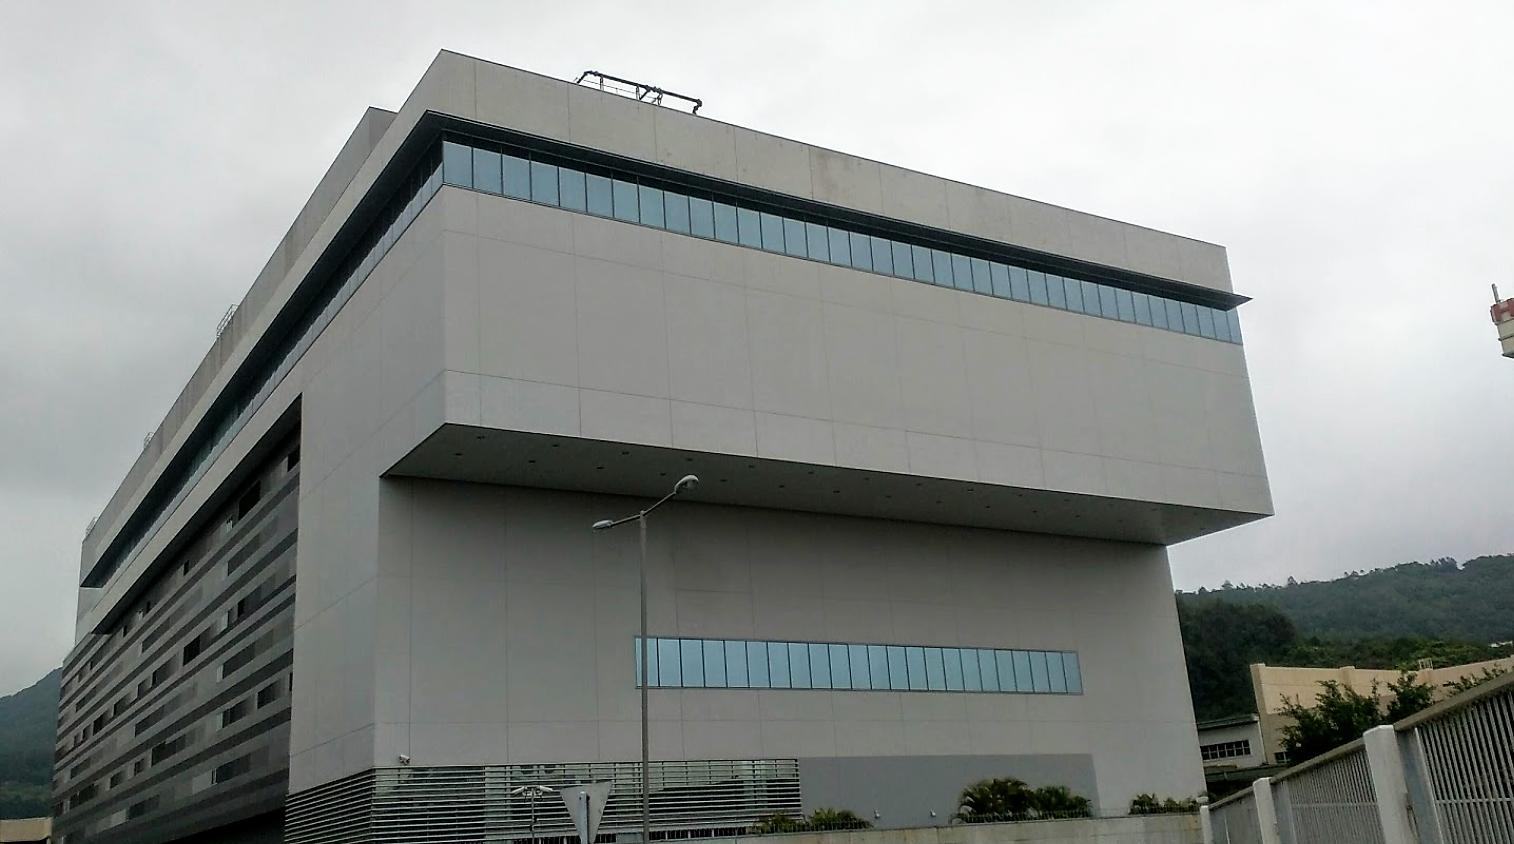 HKEX Next Generation Data Centre